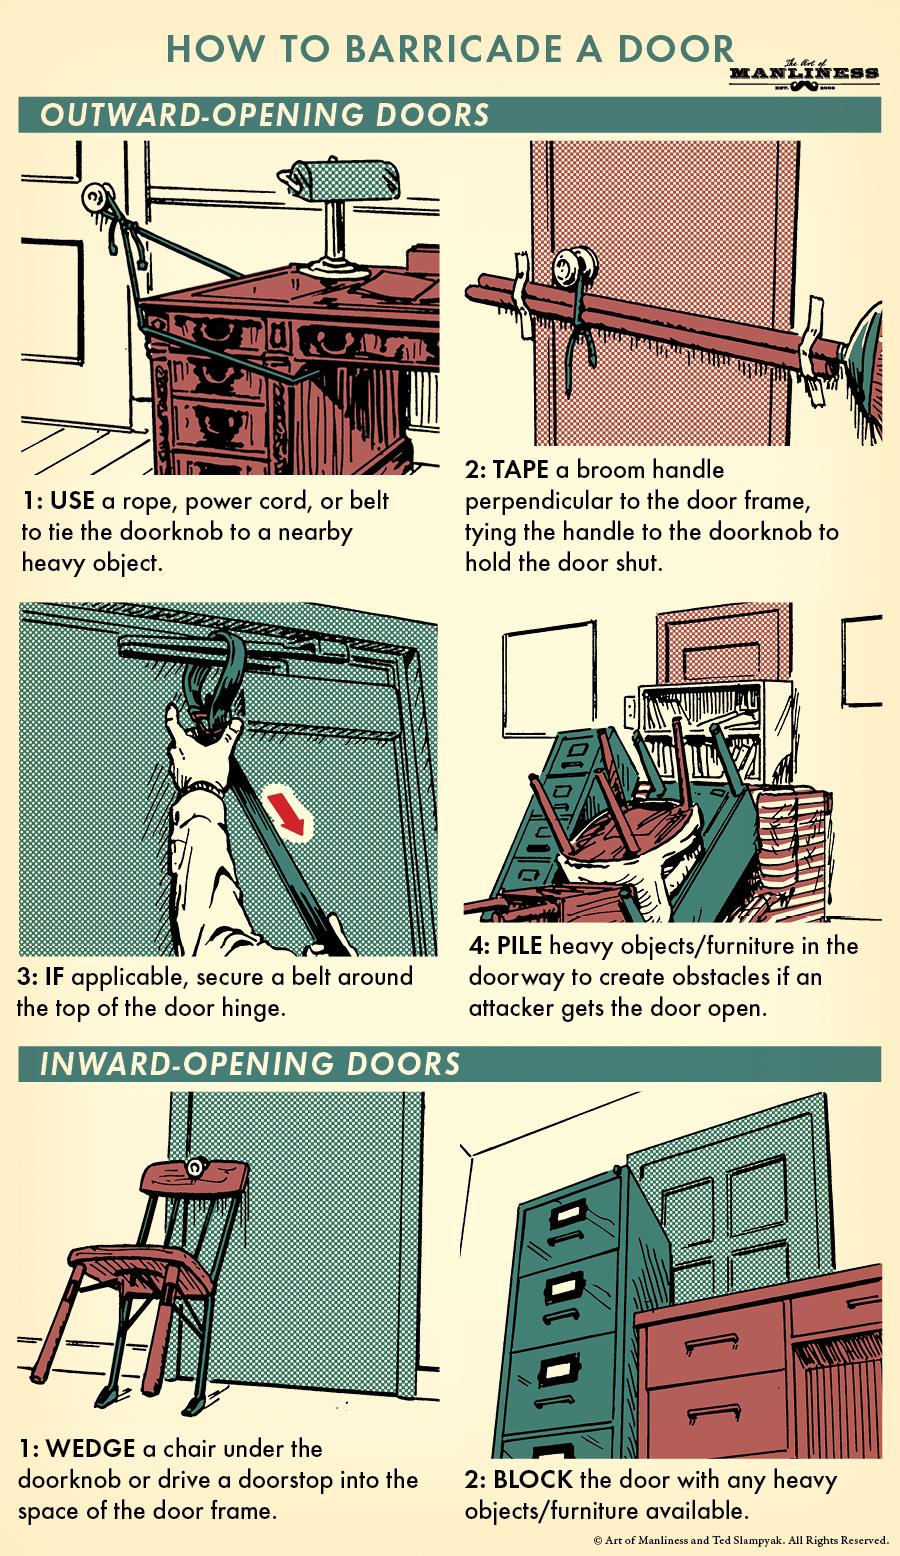 How to Barricade a Door  sc 1 st  The Art of Manliness & How to Barricade a Door | The Art of Manliness